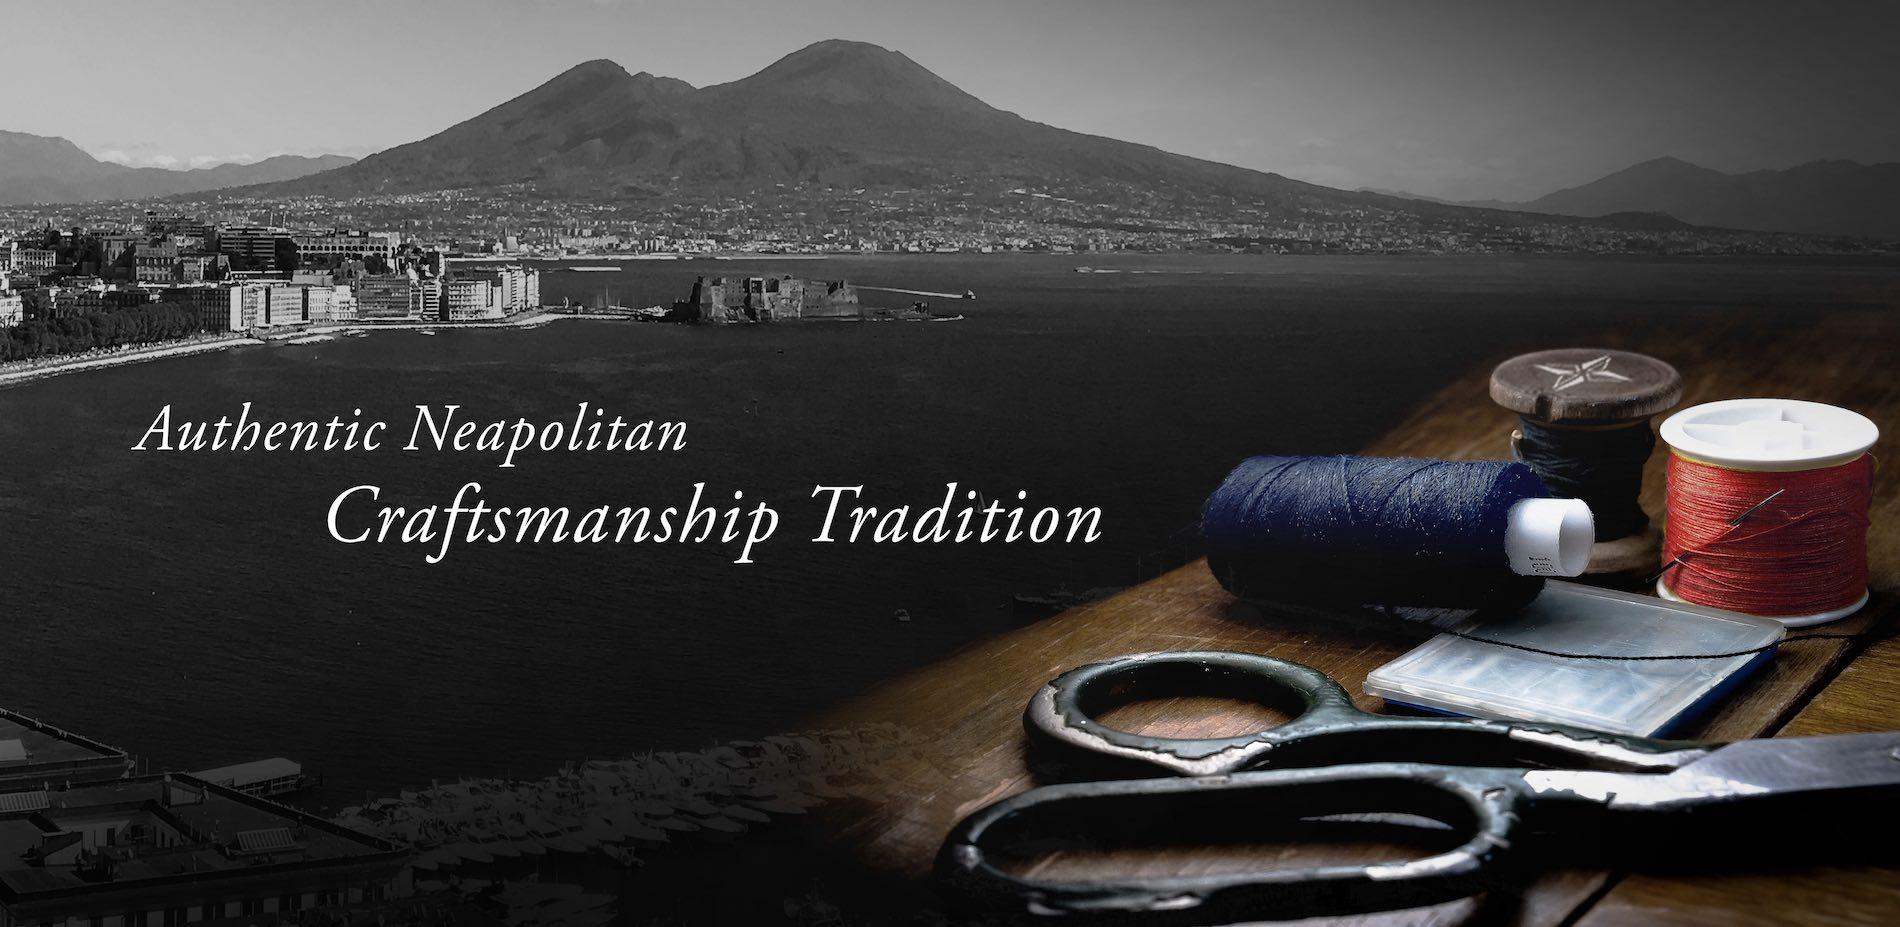 Giammarco Saviano Tailoring Napoli